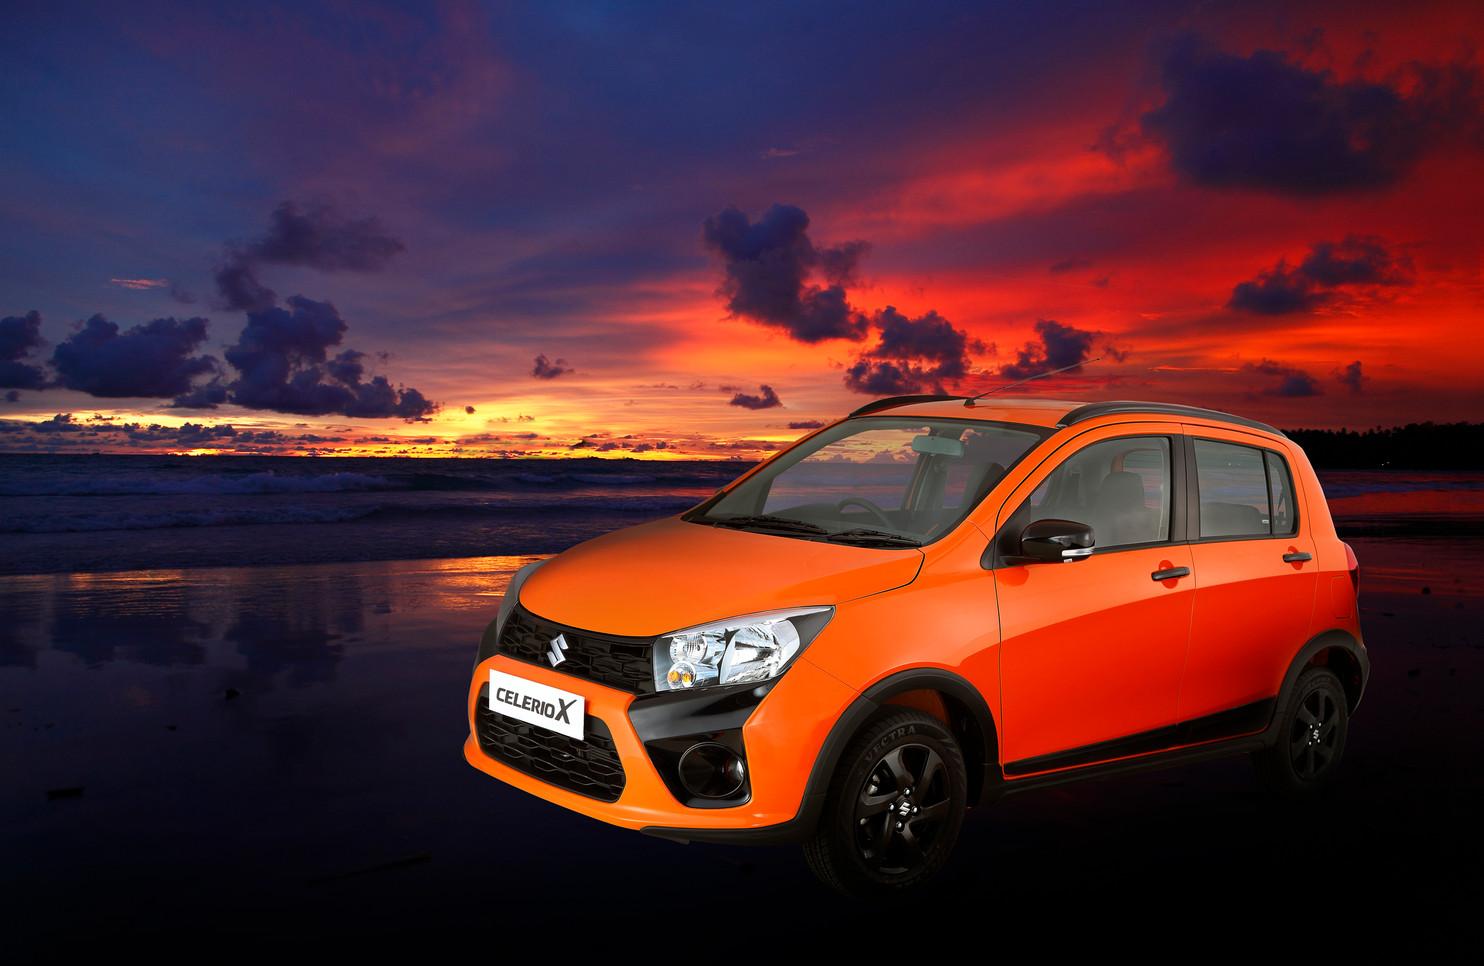 Advertising automobile photography marut